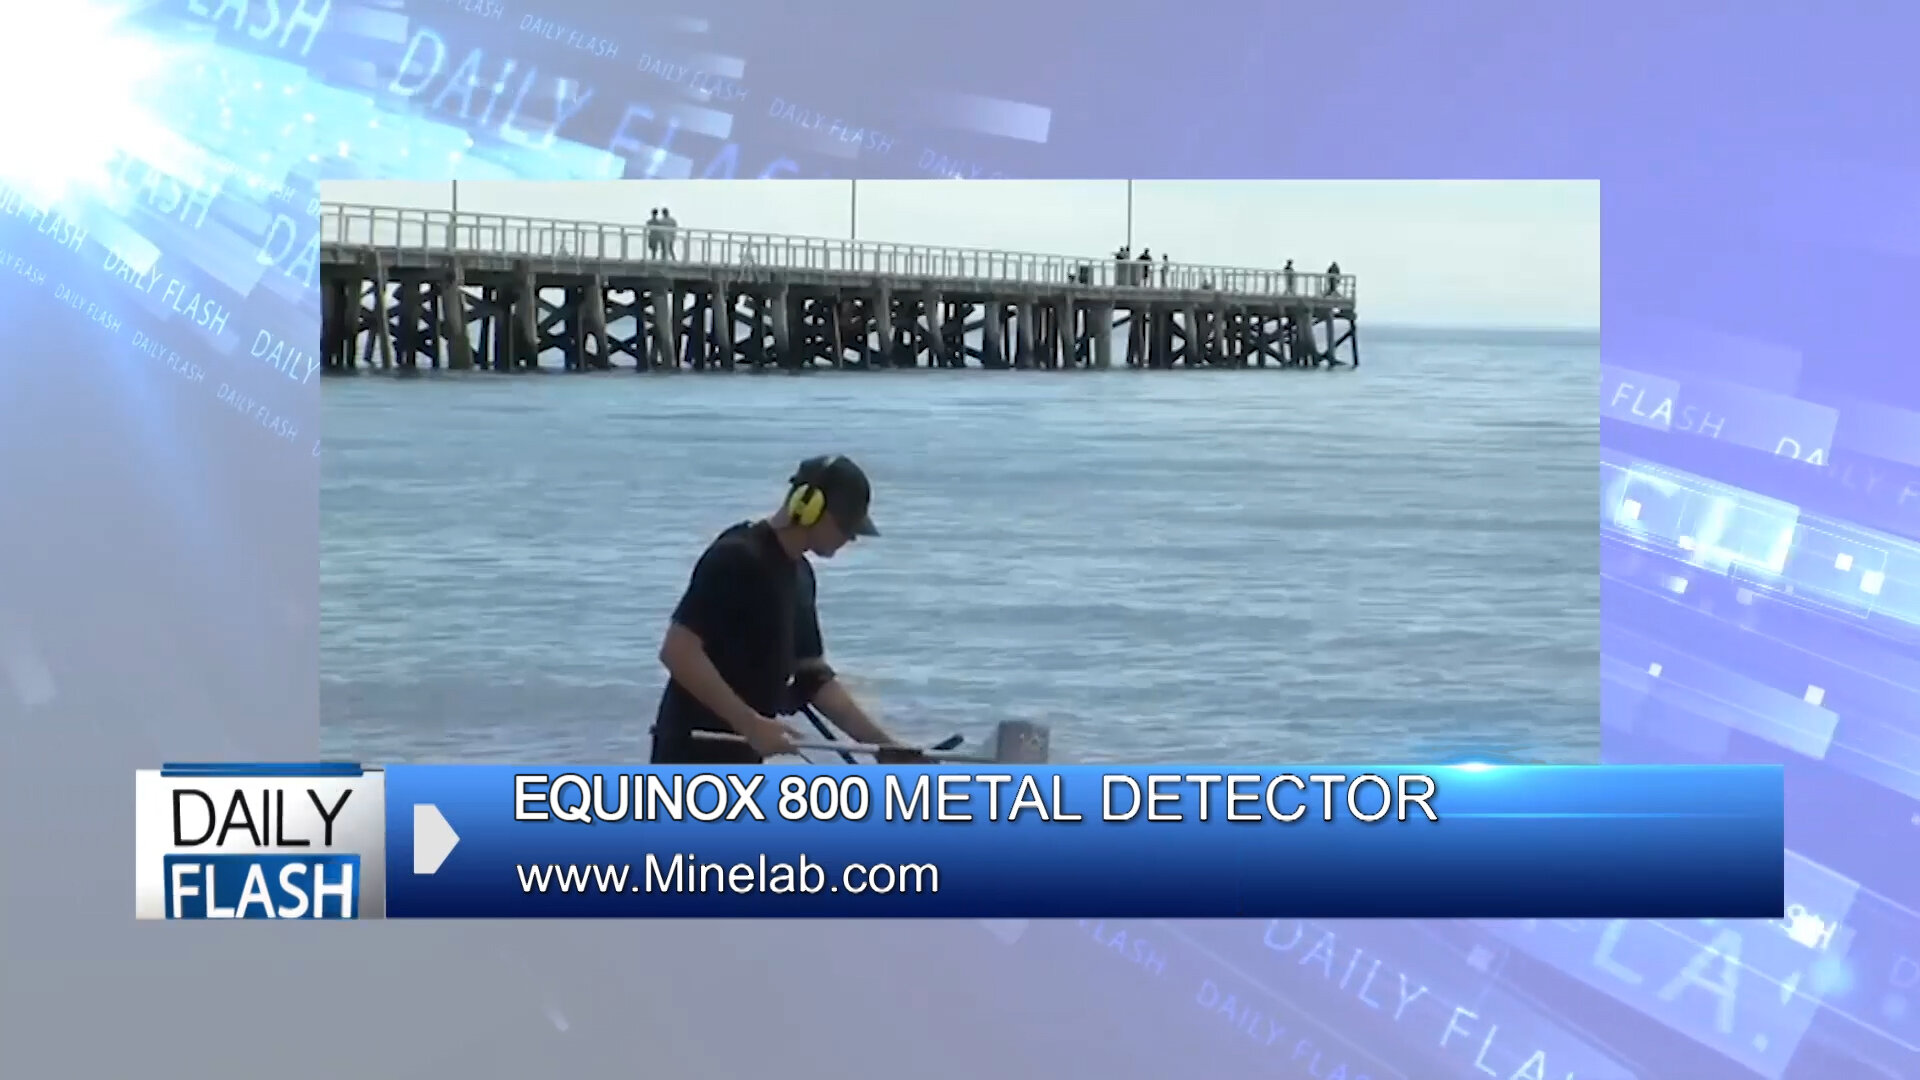 EQUINOX 800 METAL DETECTOR BY MINELAB - $899.00Shop Now